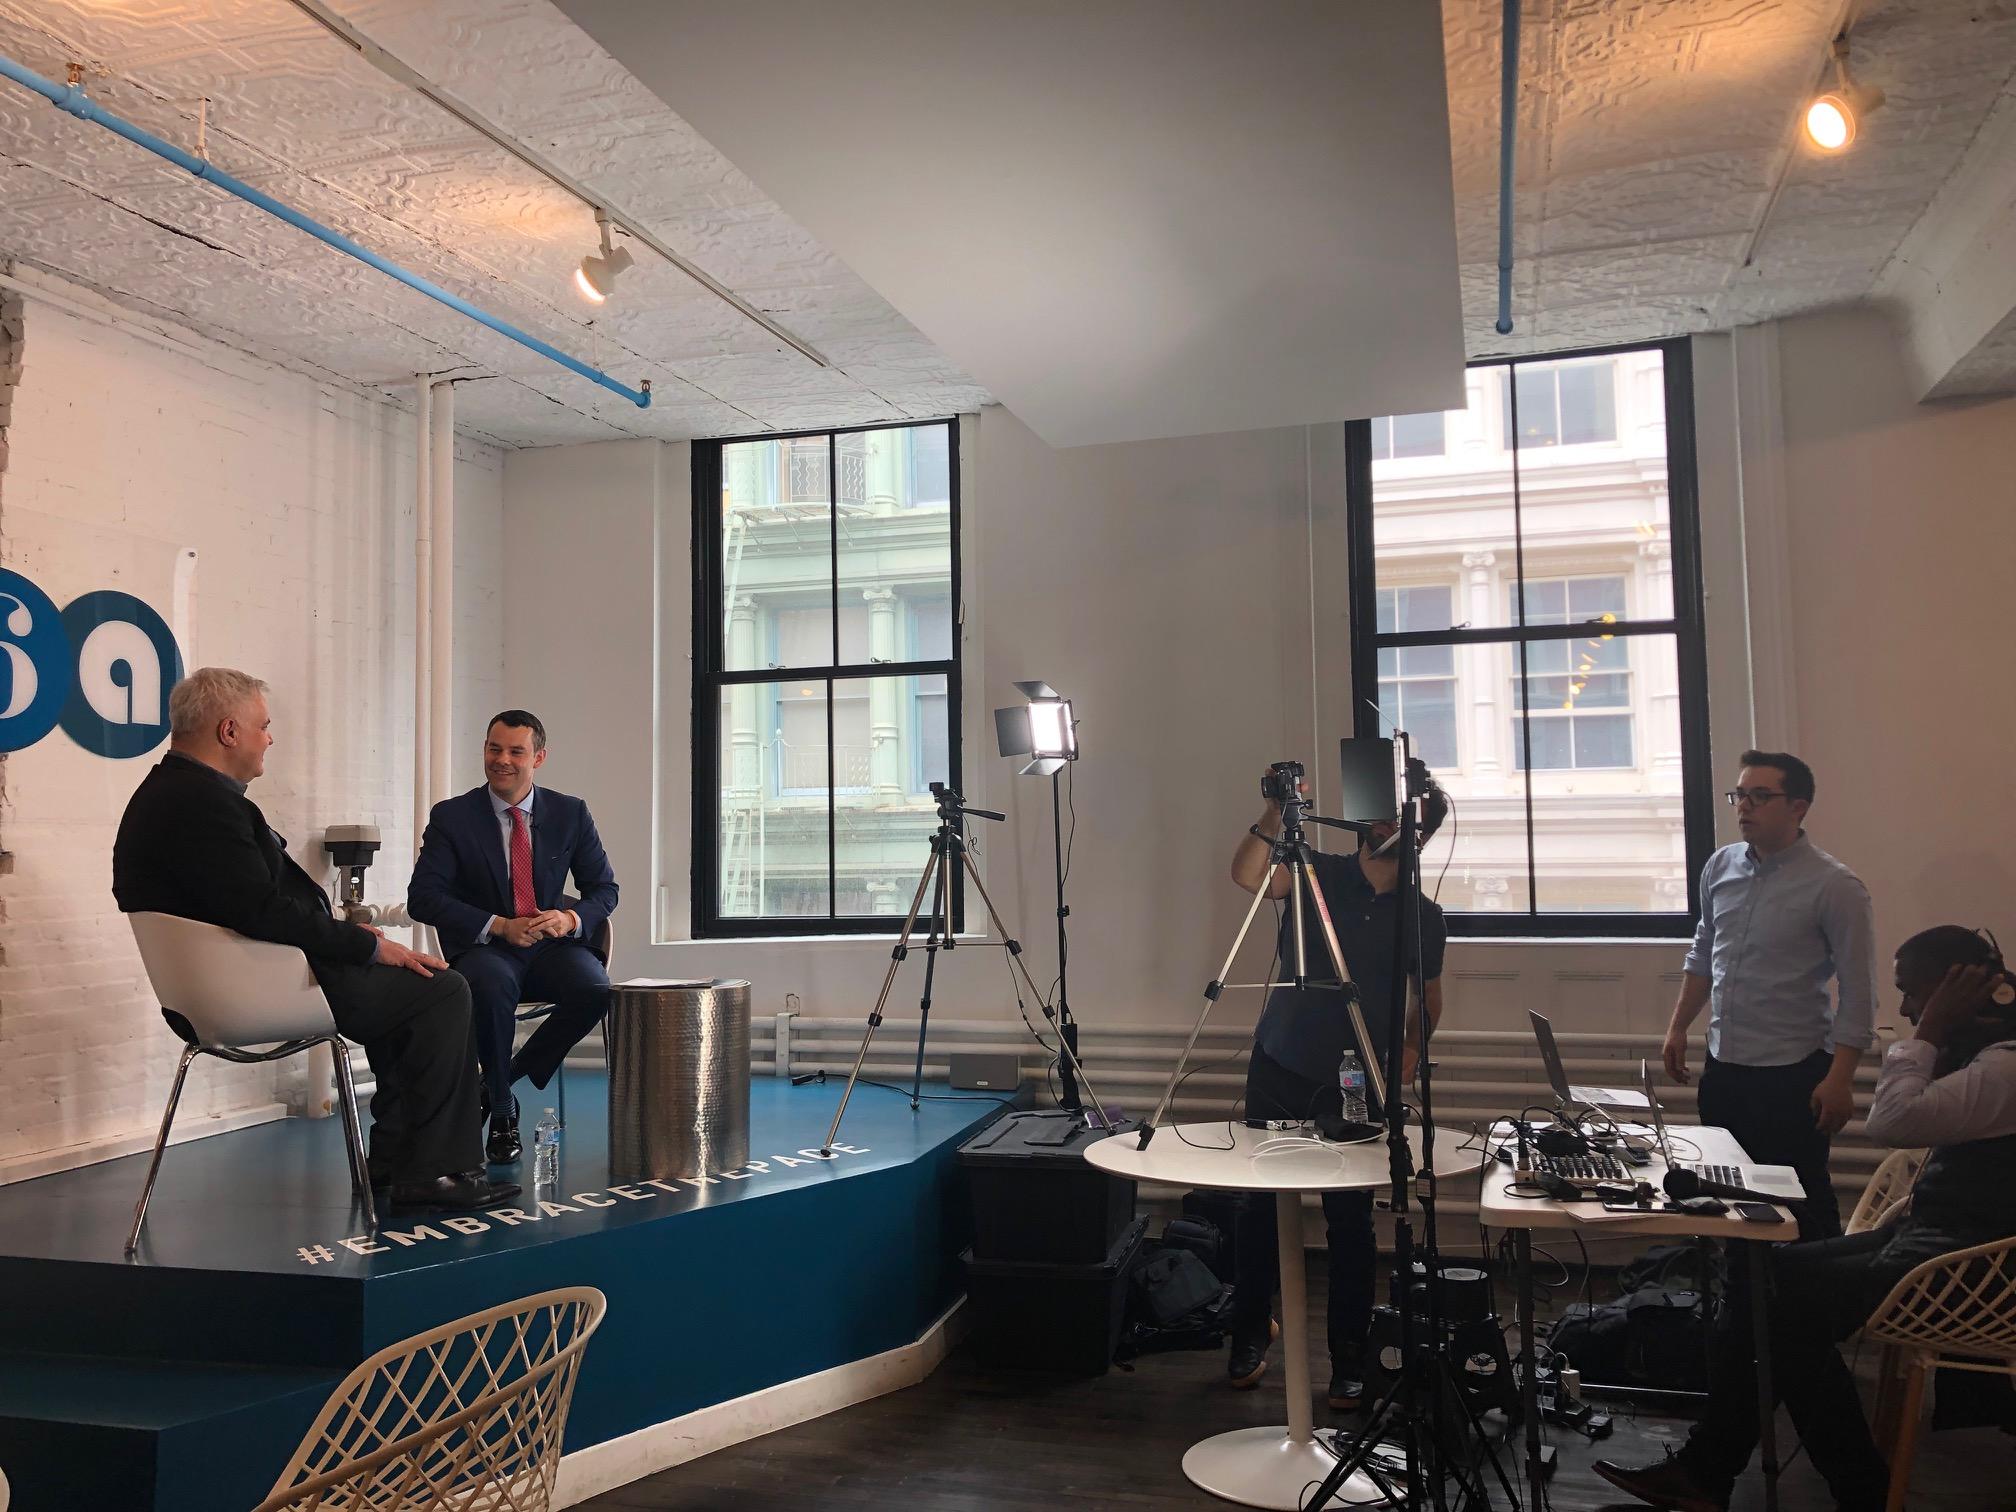 Al DiGuido, CRO North 6th Agency - Former CEO Zeta | CEO Epsilonon CharlieNYC Audio Podcast